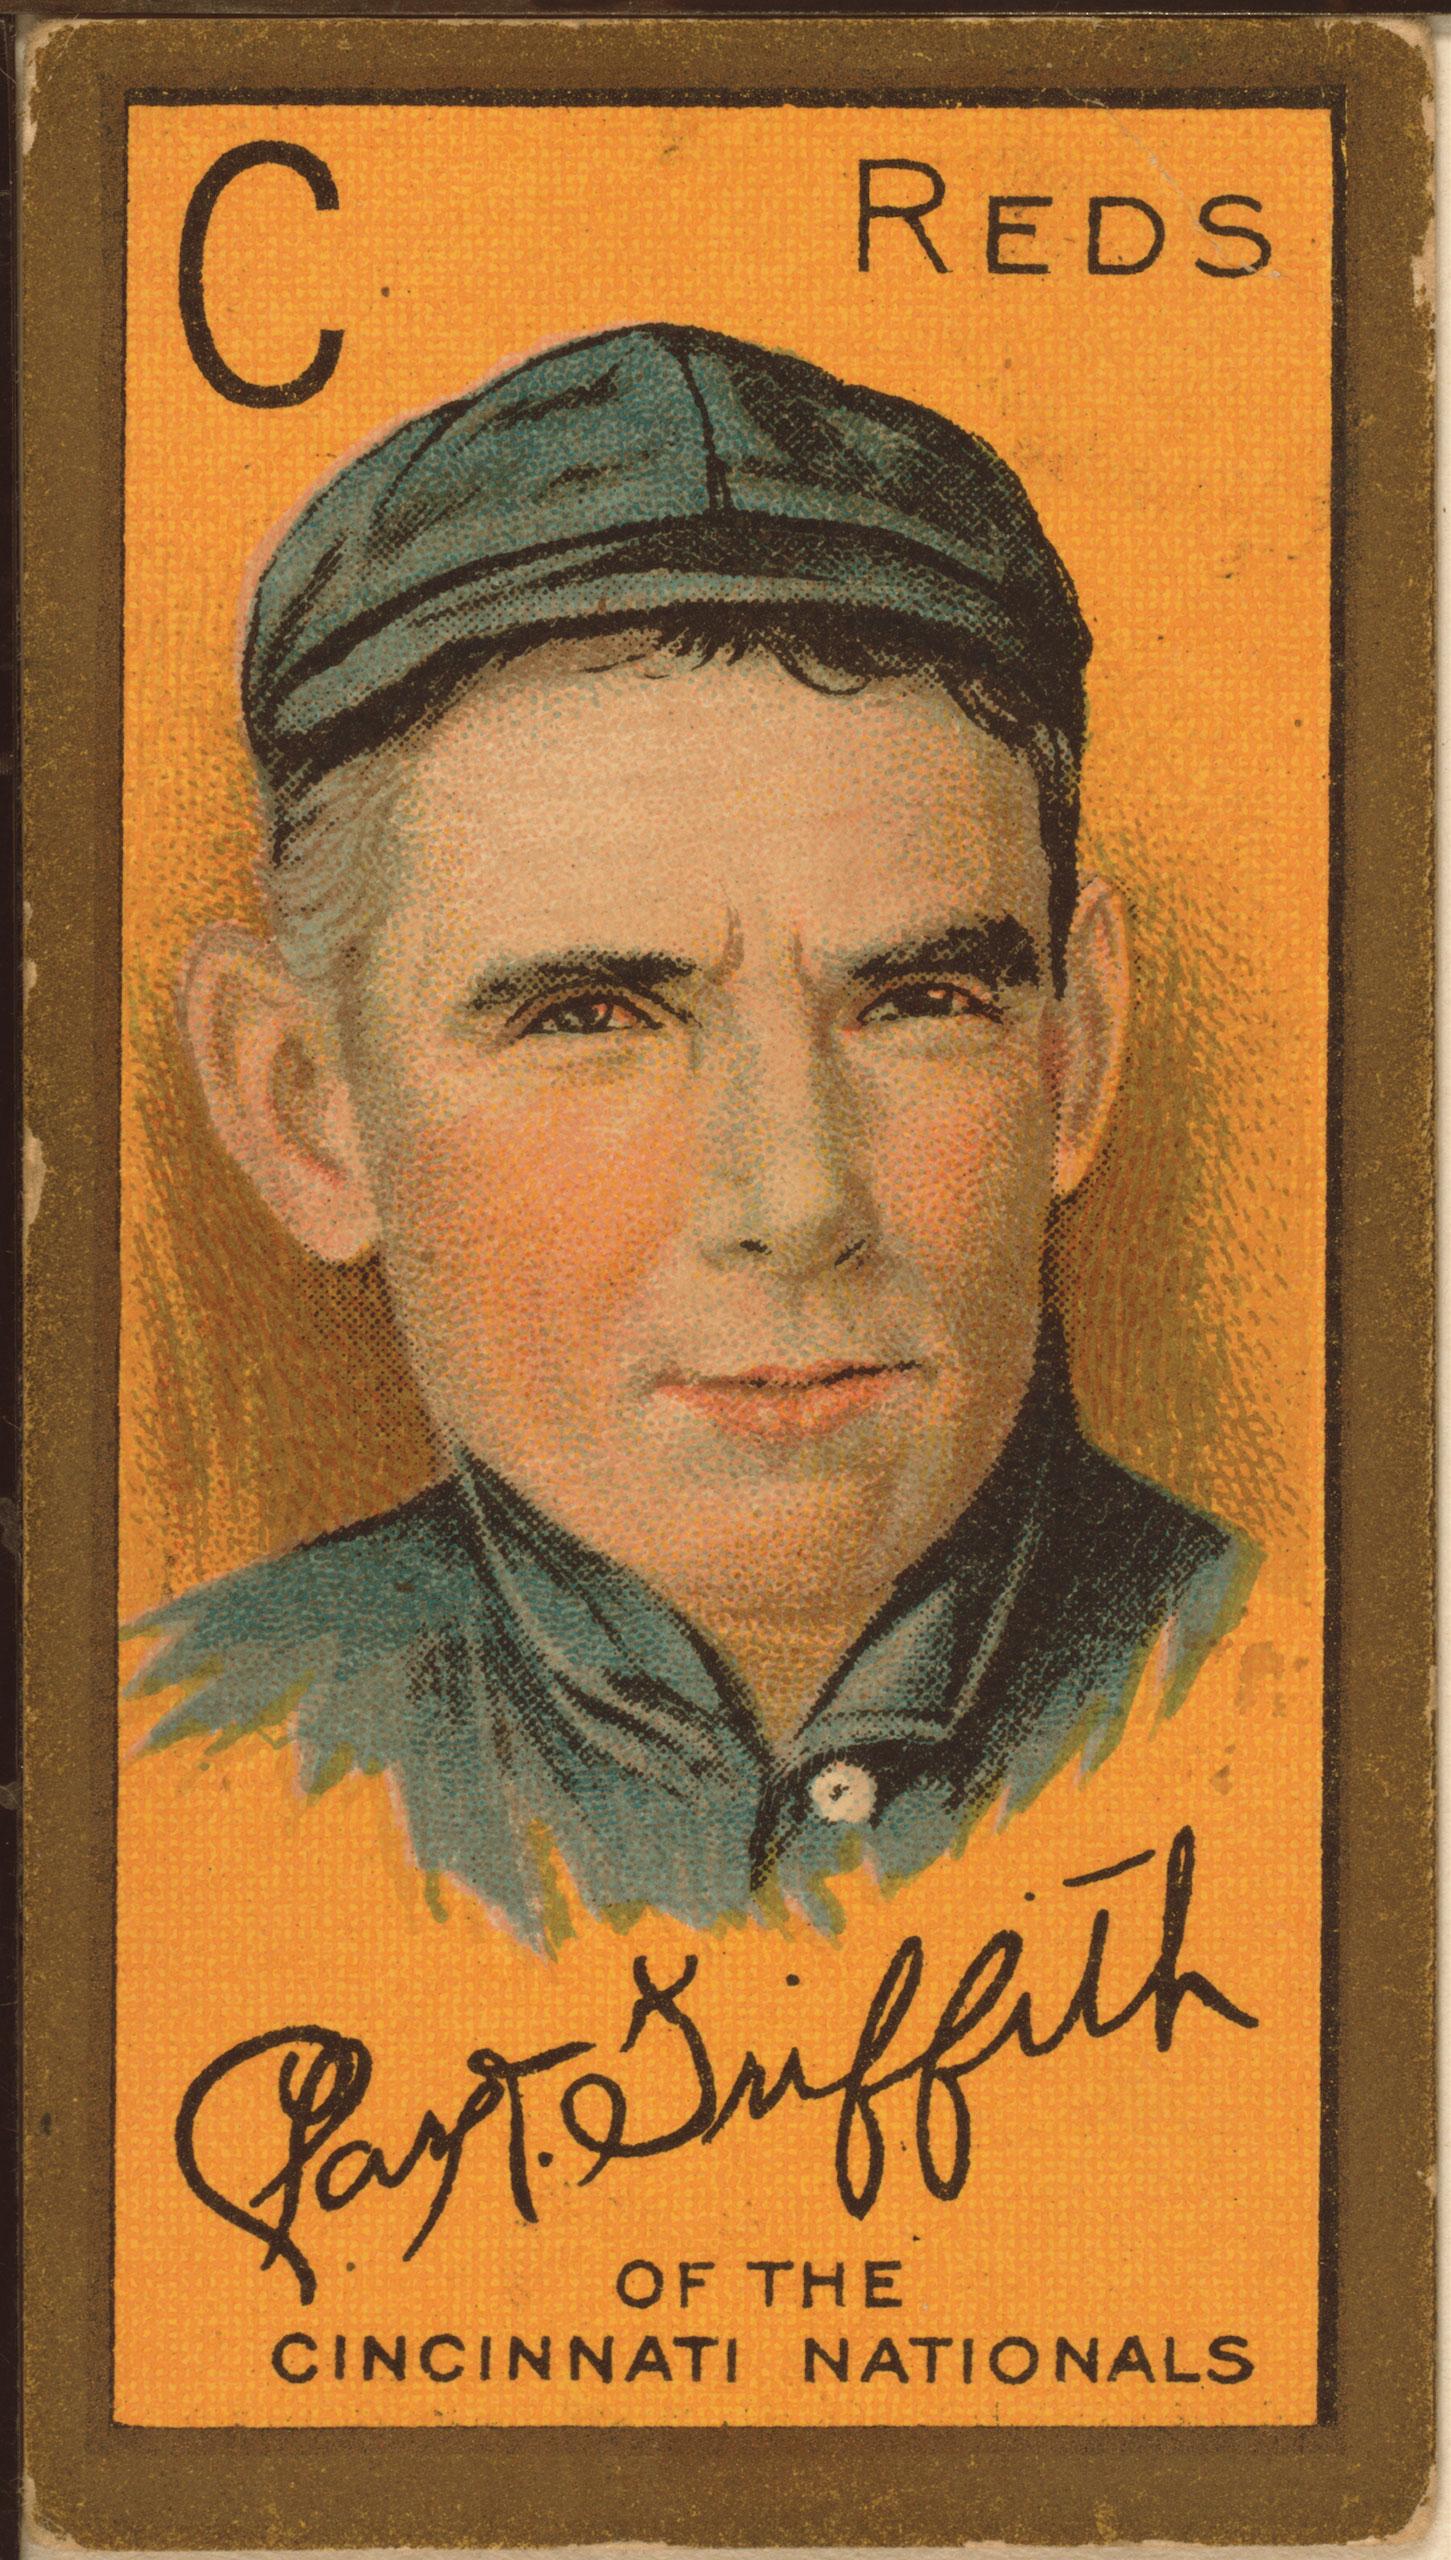 Clark Griffith, Cincinnati Reds, baseball card, 1911.